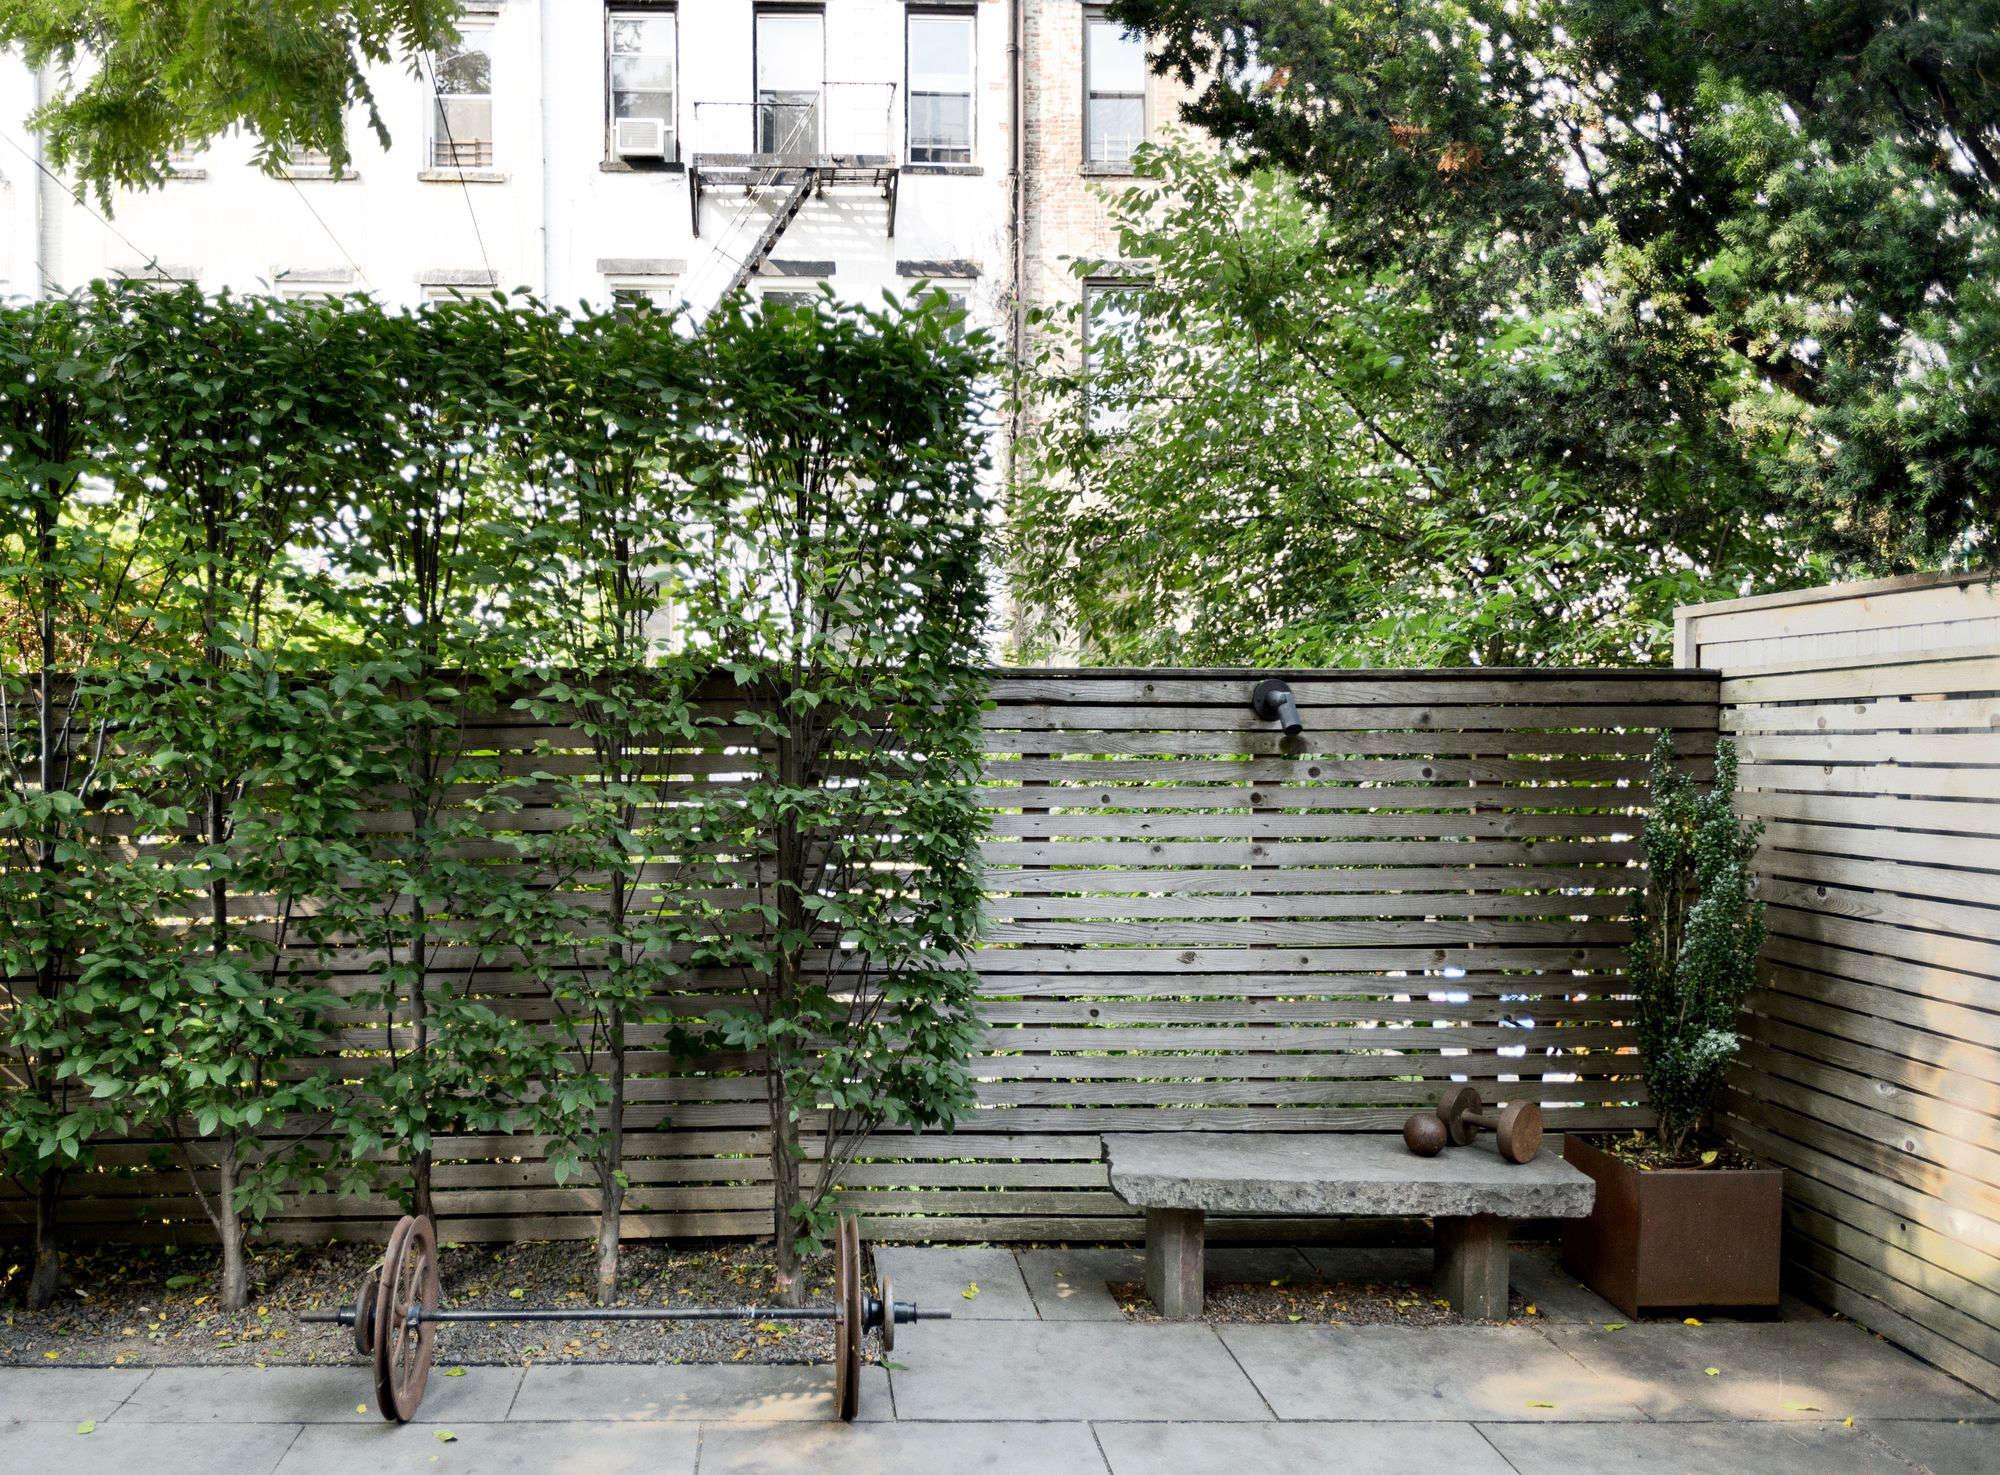 Garden Hacks: 9 Ideas for Privacy Screens - Gardenista